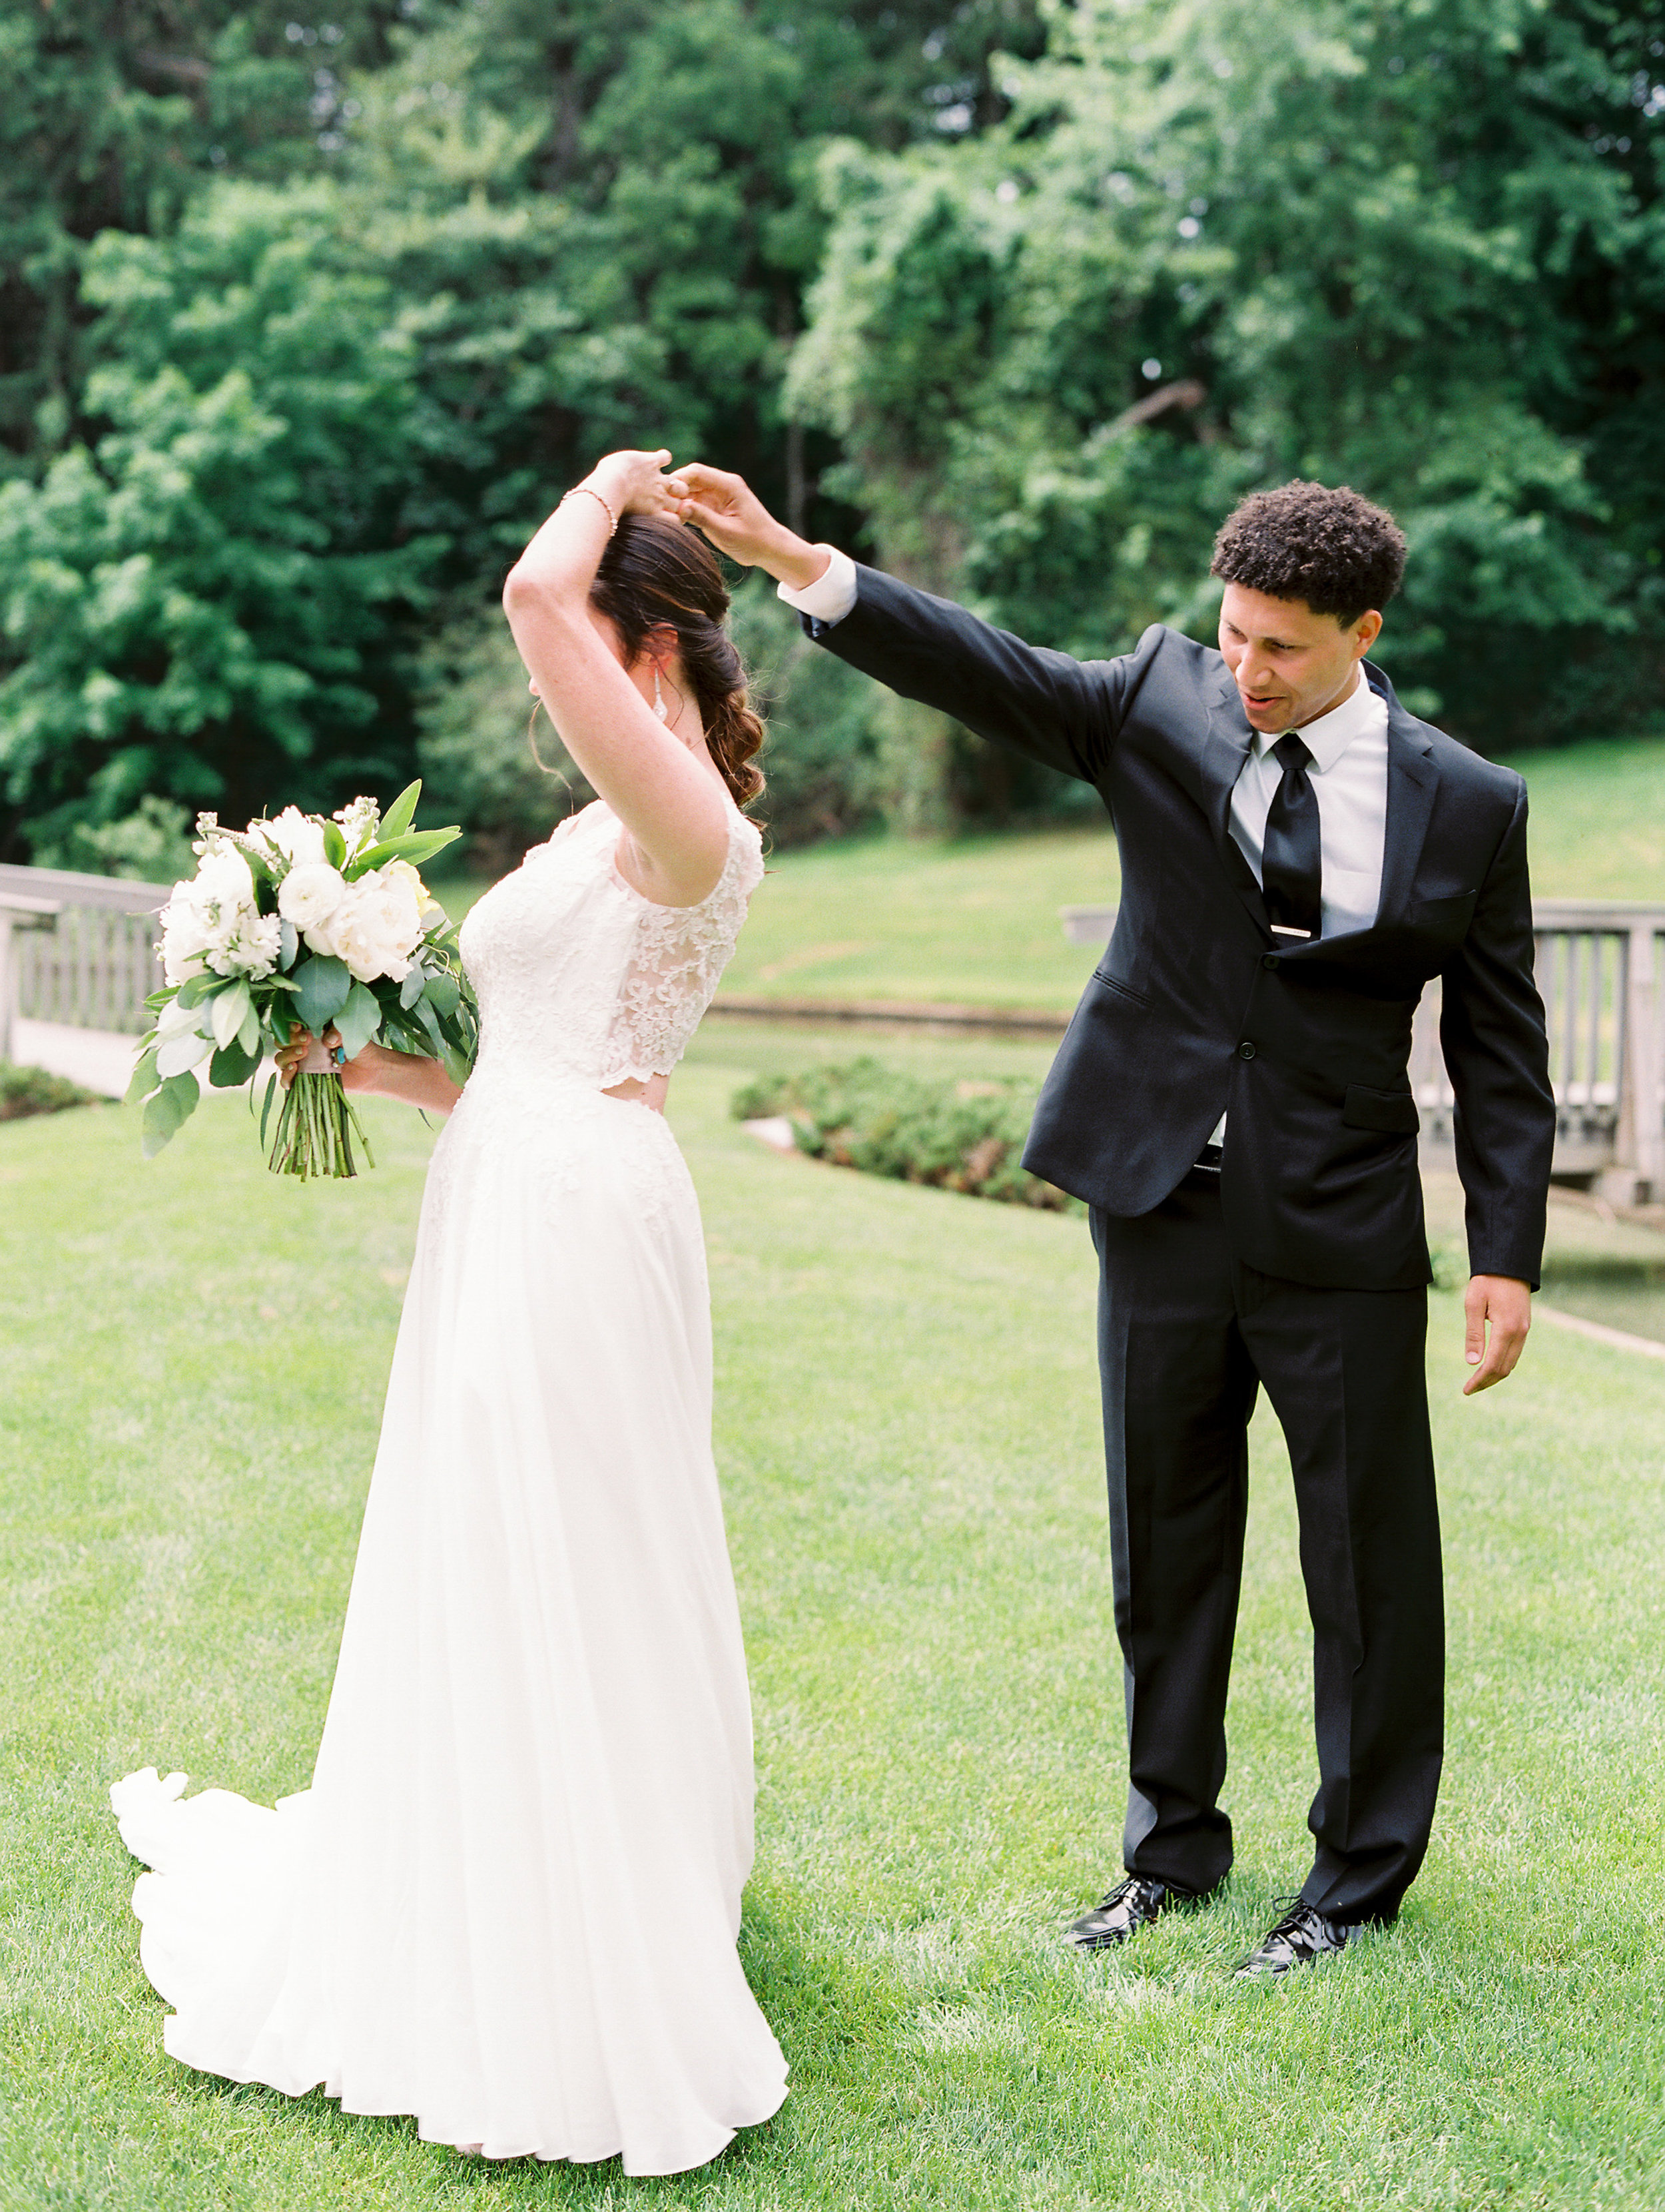 Julius+Wedding+FirstLookf-1.jpg